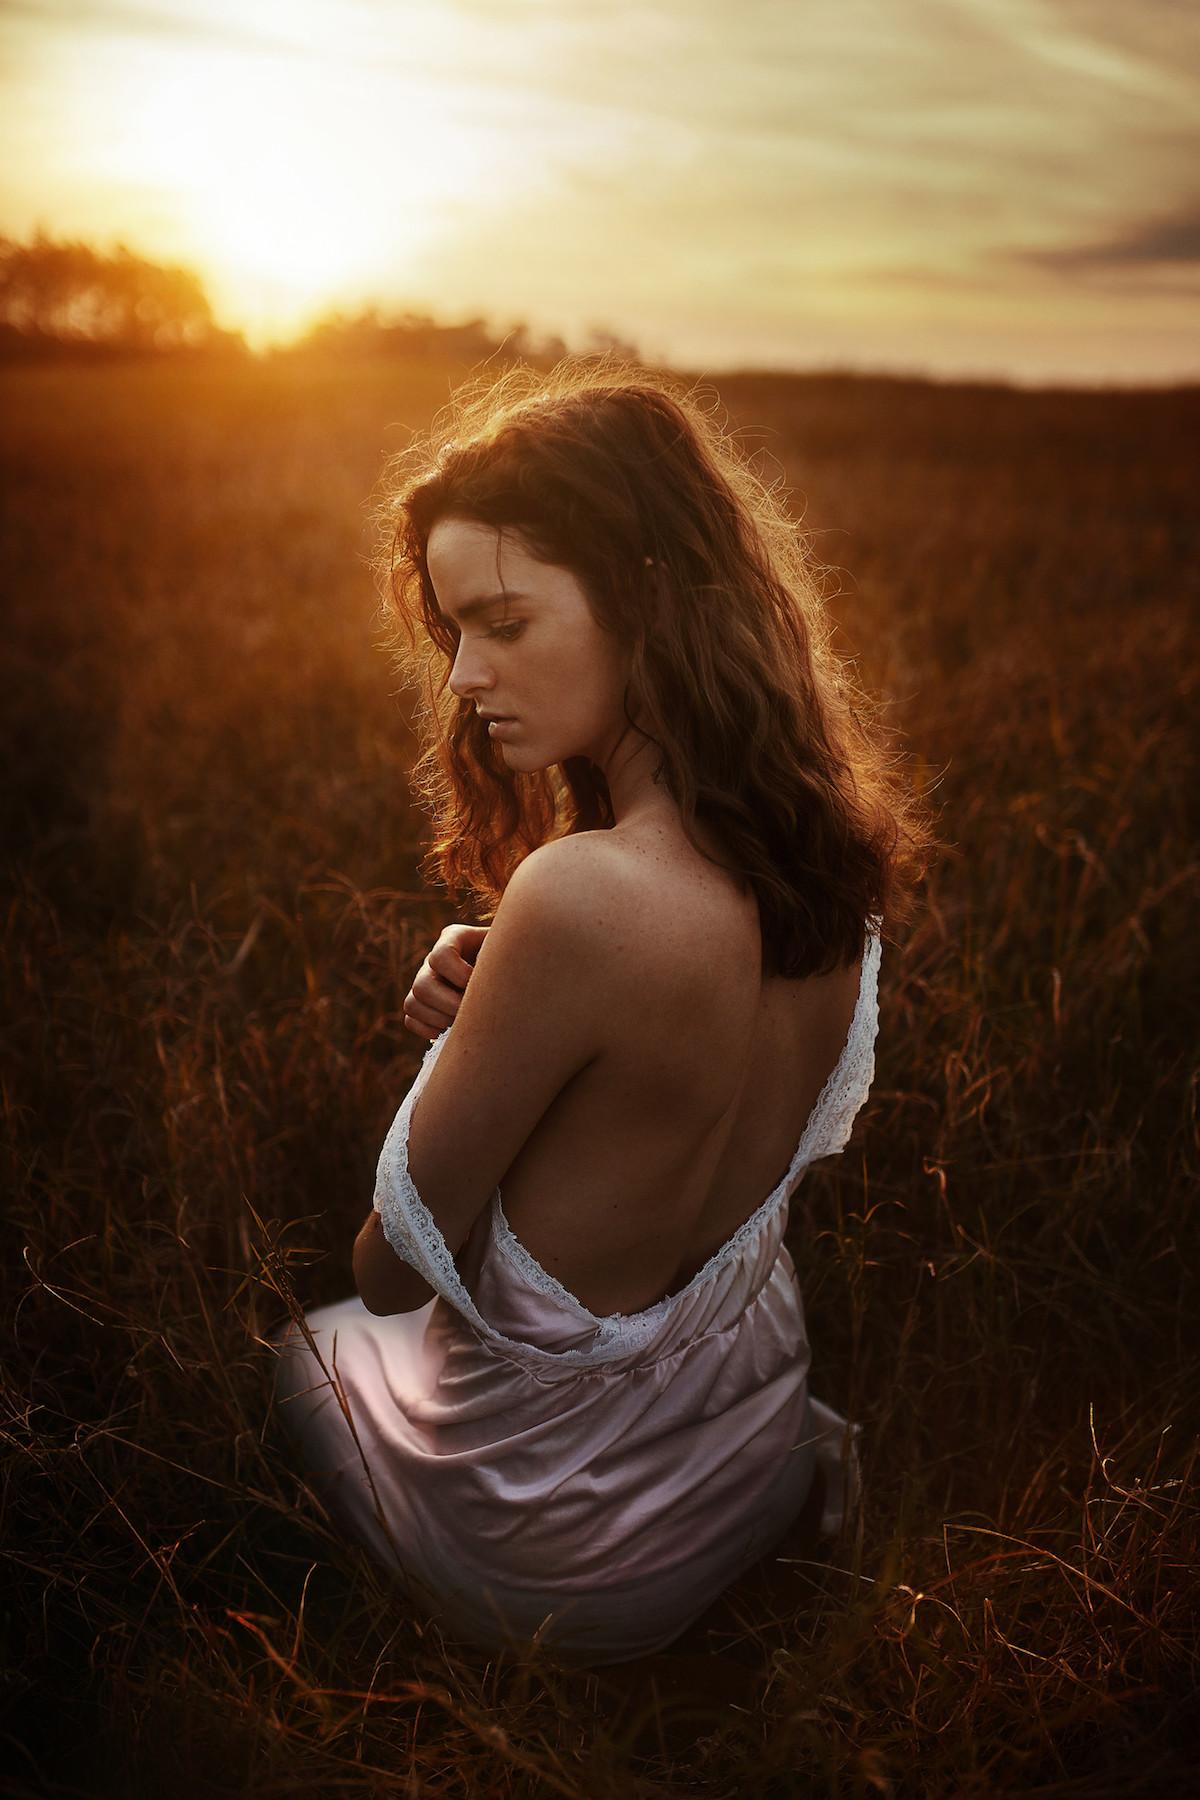 Fine Art Photography TJ Drysdale